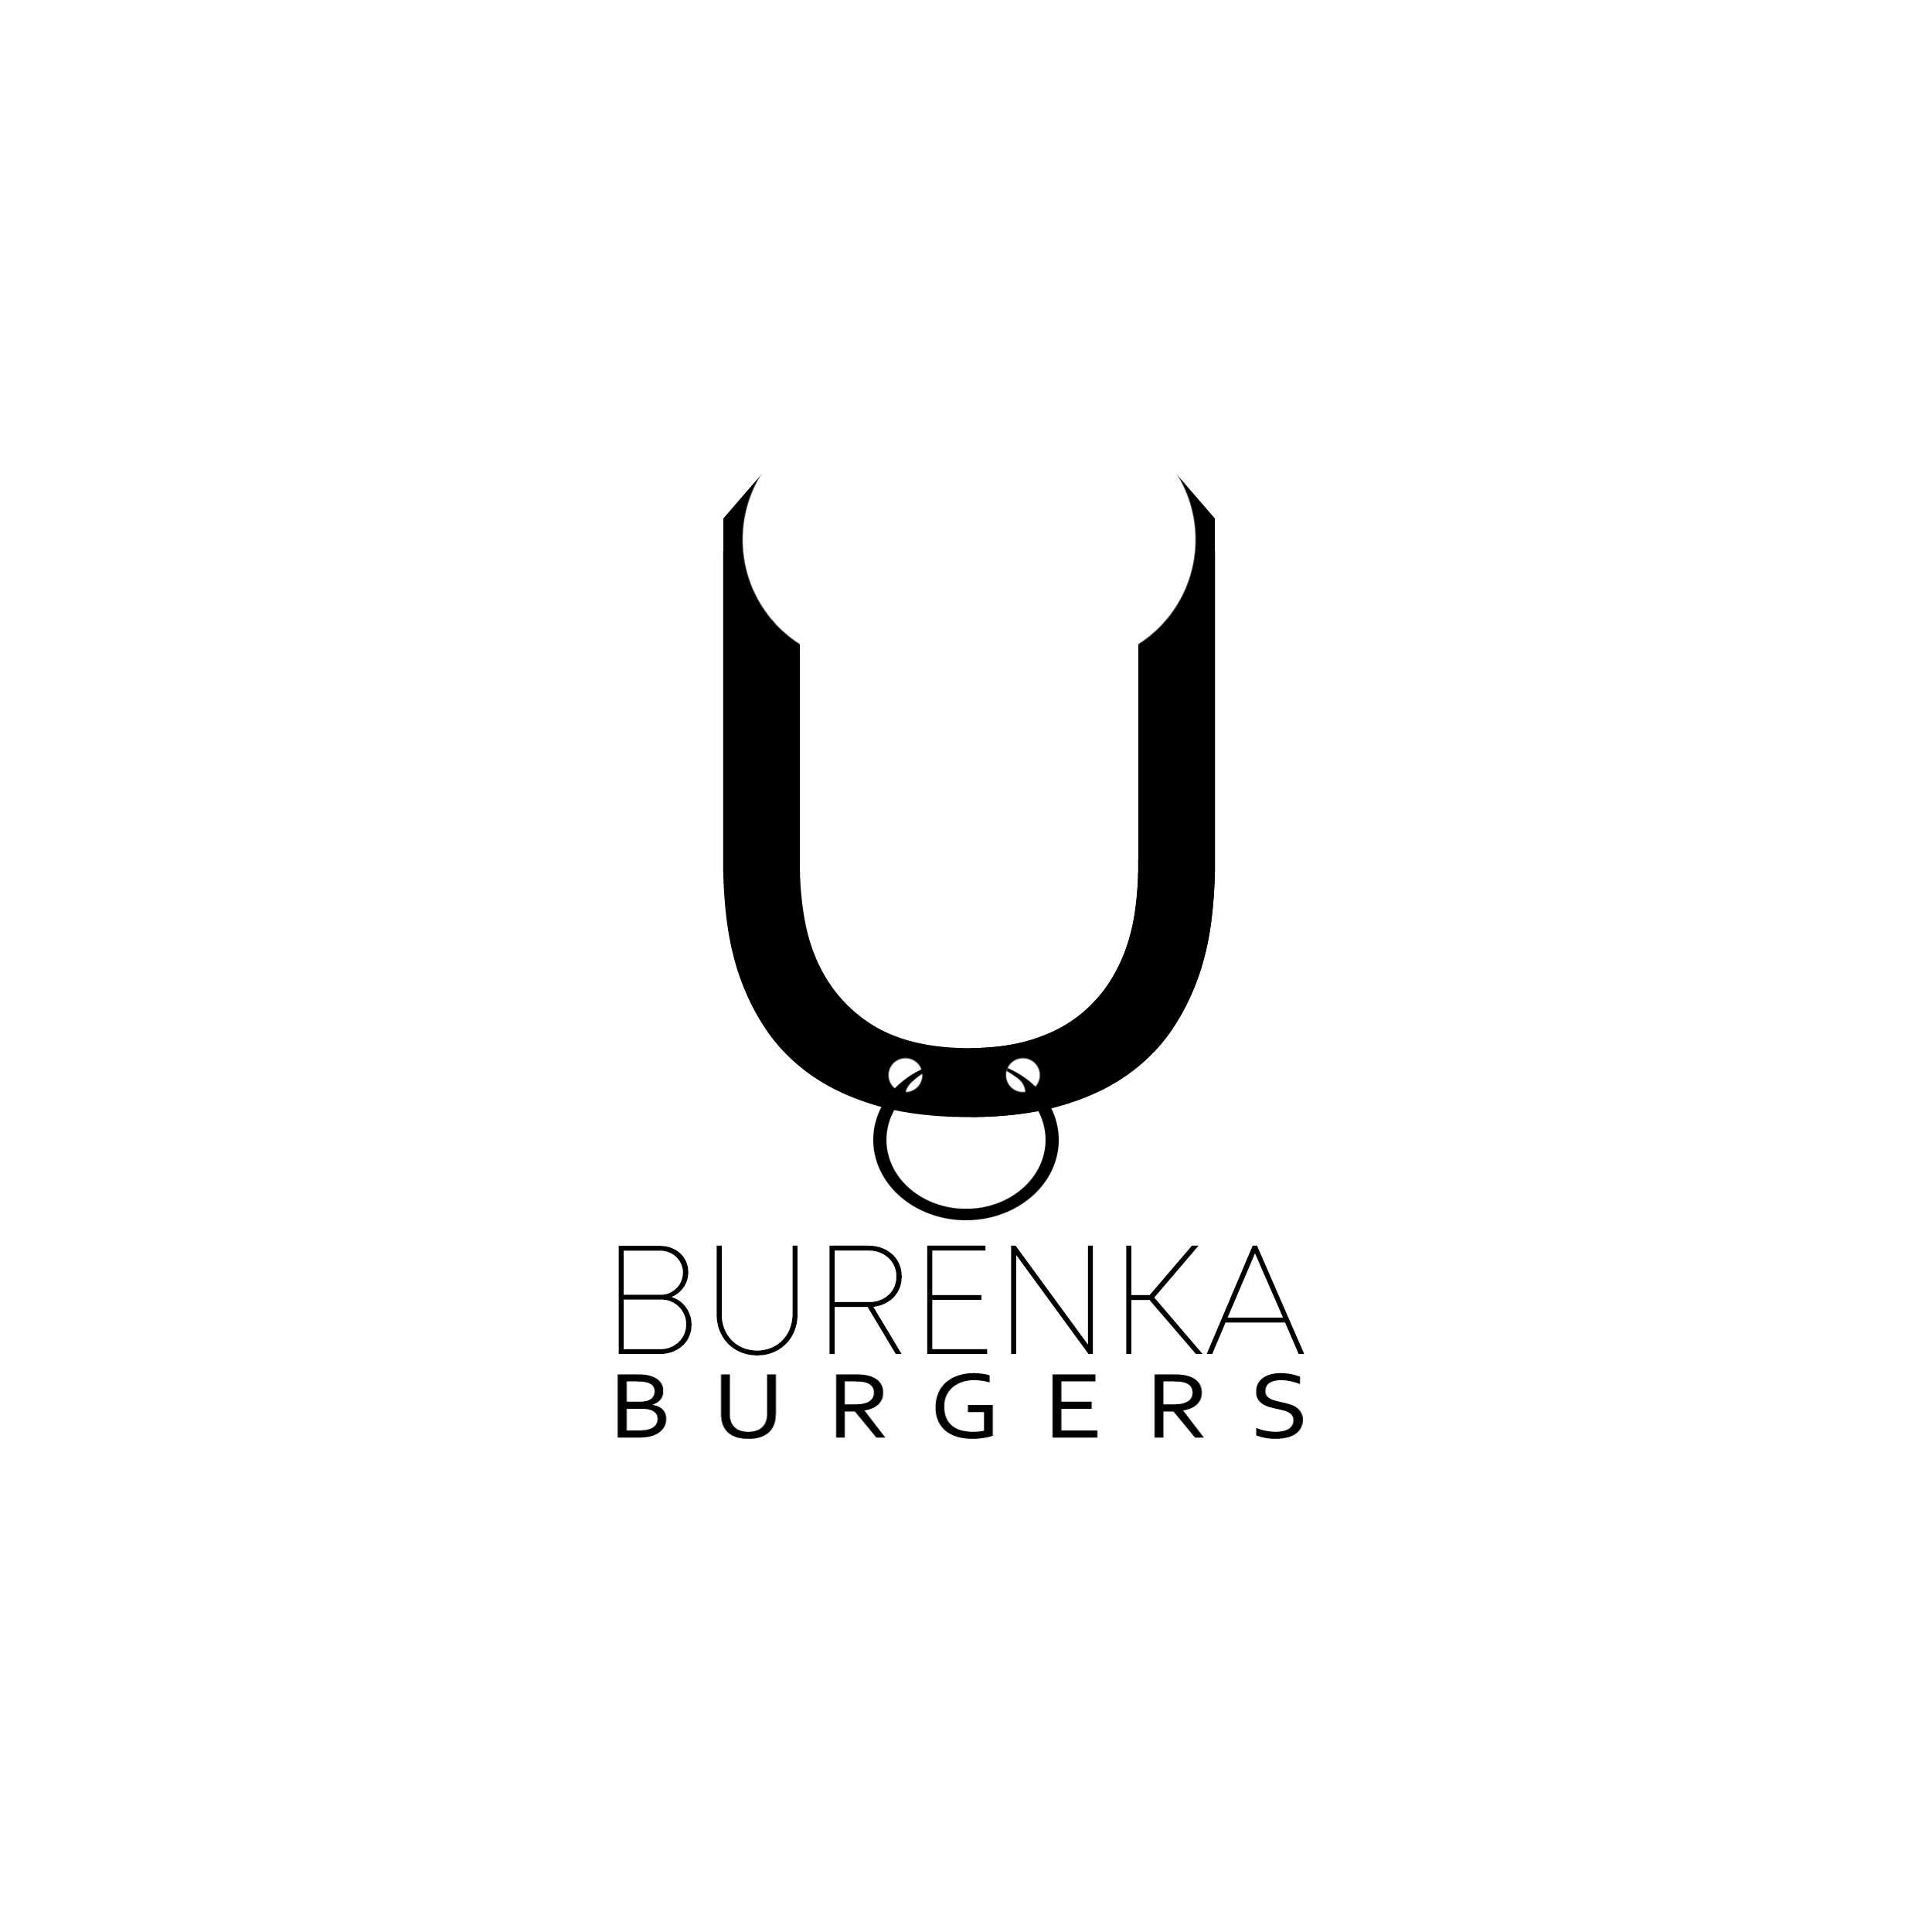 Логотип для Бургерной с Пекарней фото f_6635e1b7749d538b.png